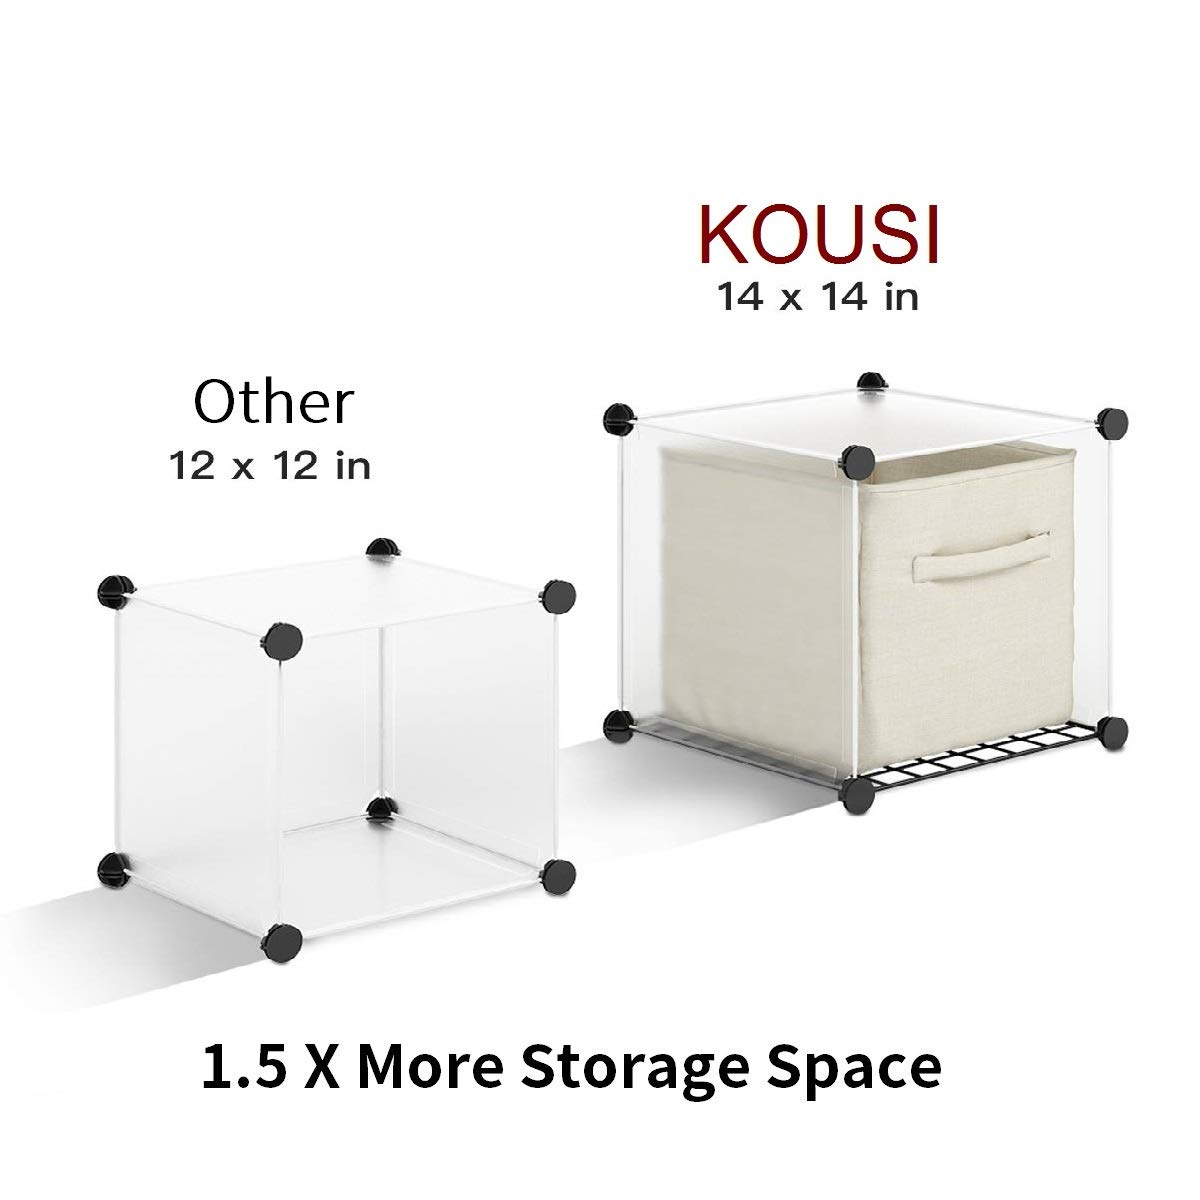 KOUSI Portable Storage Cubbies Storage Shelves Storage Organizer Shelf for Clothes Portable Shelf Toy Organizer Cabinet Plastic Dresser Clothes Storage Storage Cubes, Black, 12 Cubes by KOUSI (Image #5)